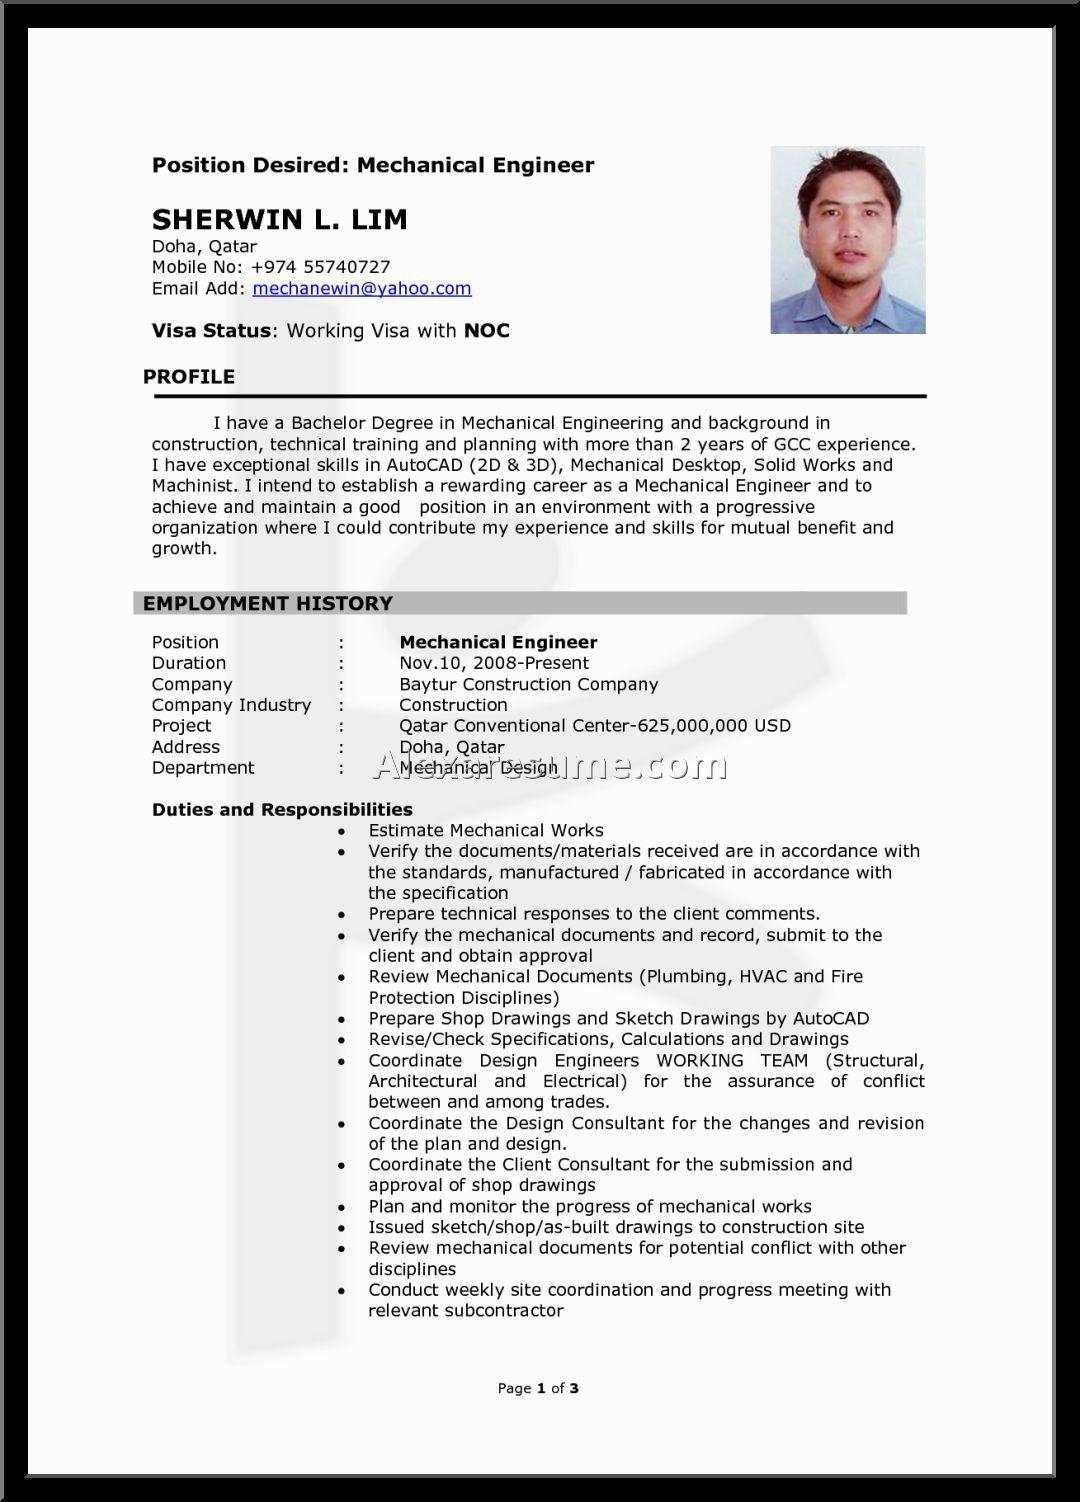 A C Technician Resume Format Format Resume Technician Resume Format Job Resume Format Resume Templates